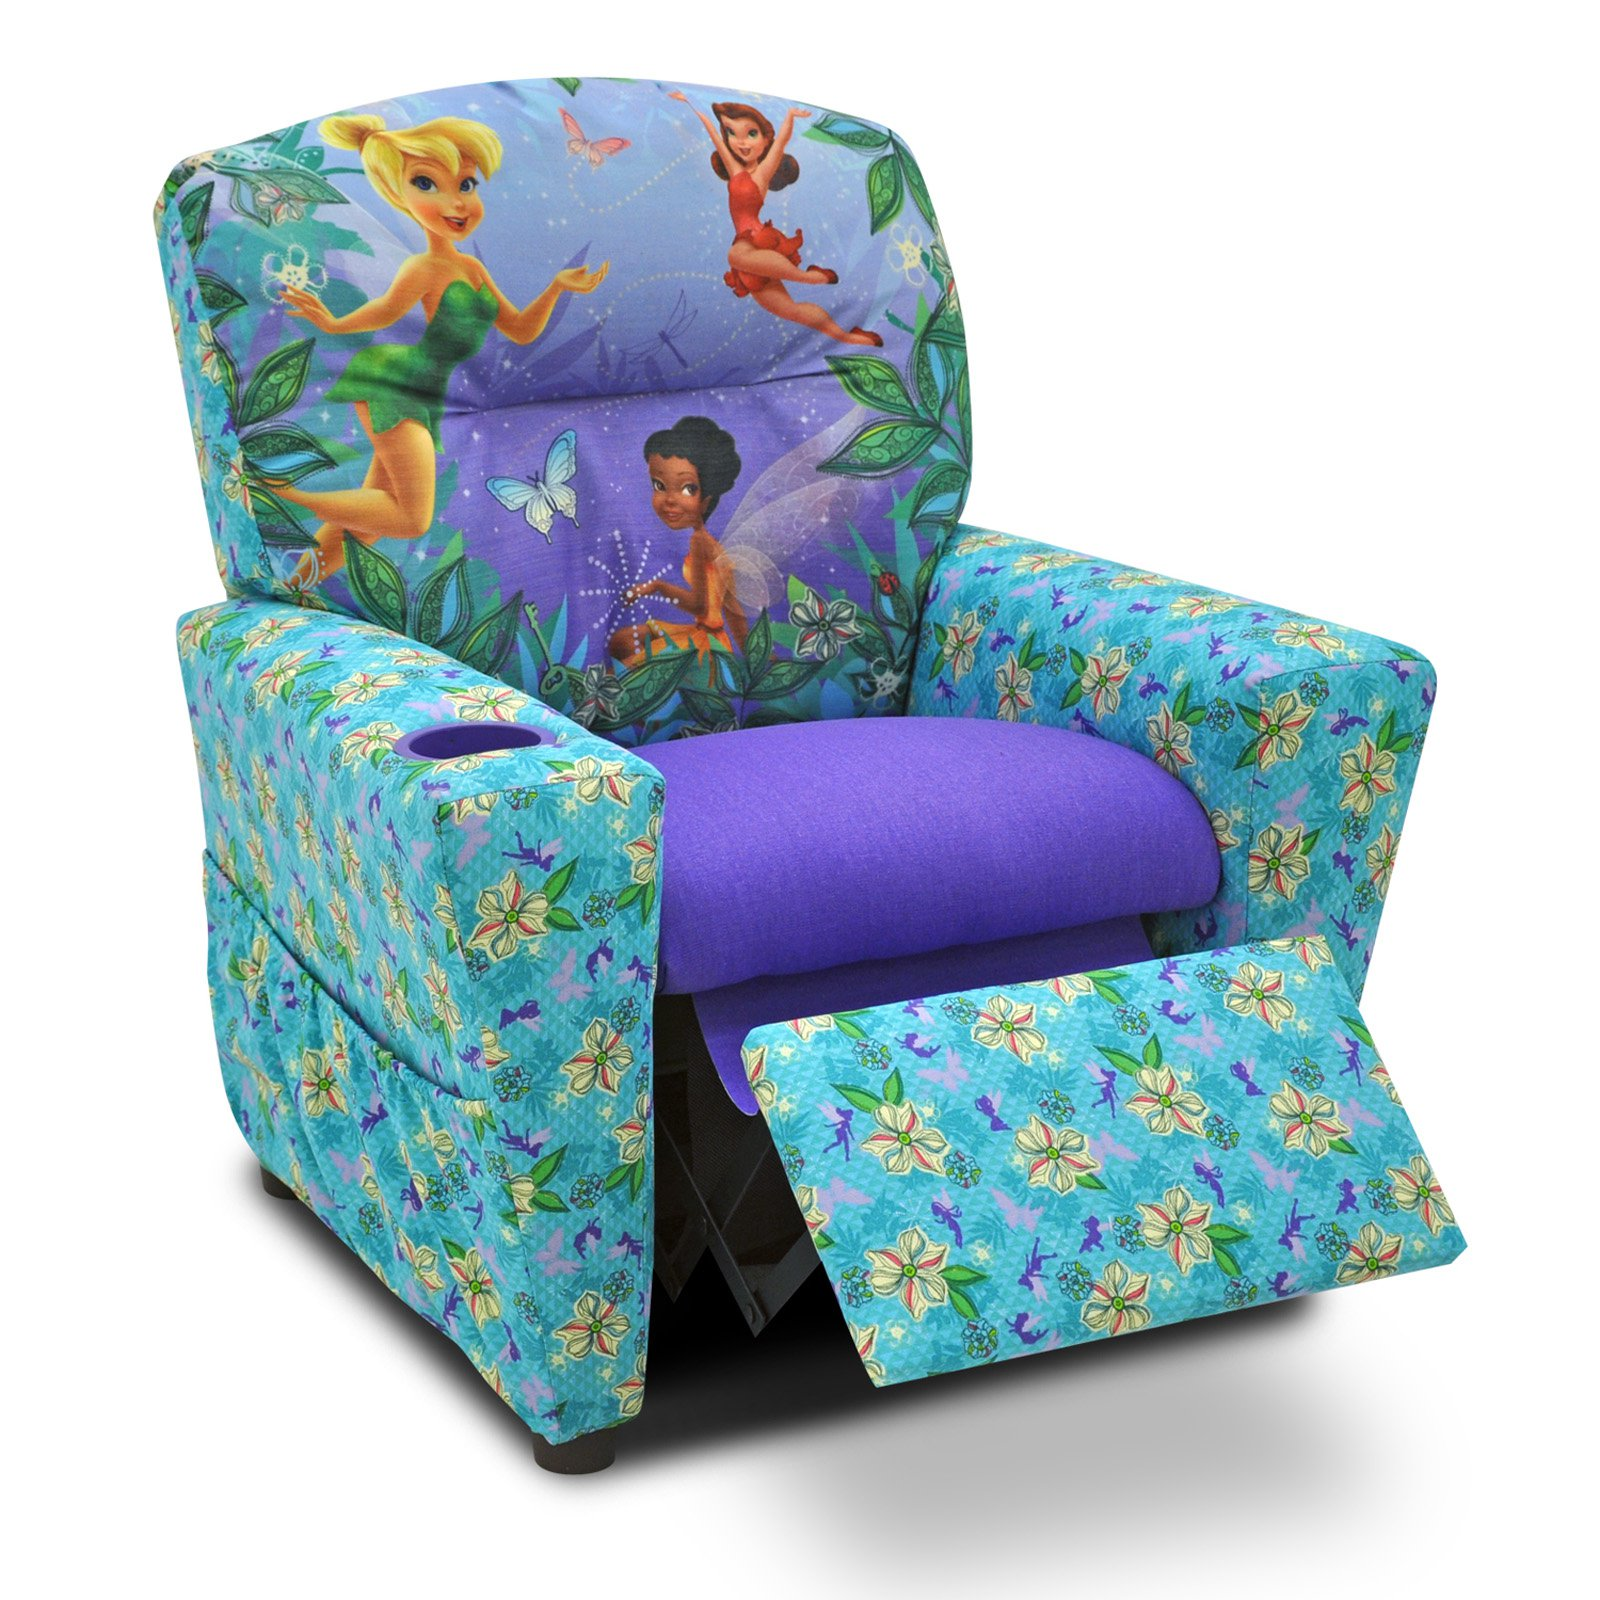 Child Recliner Rocker Off 52, Toddler Recliner Rocking Chair